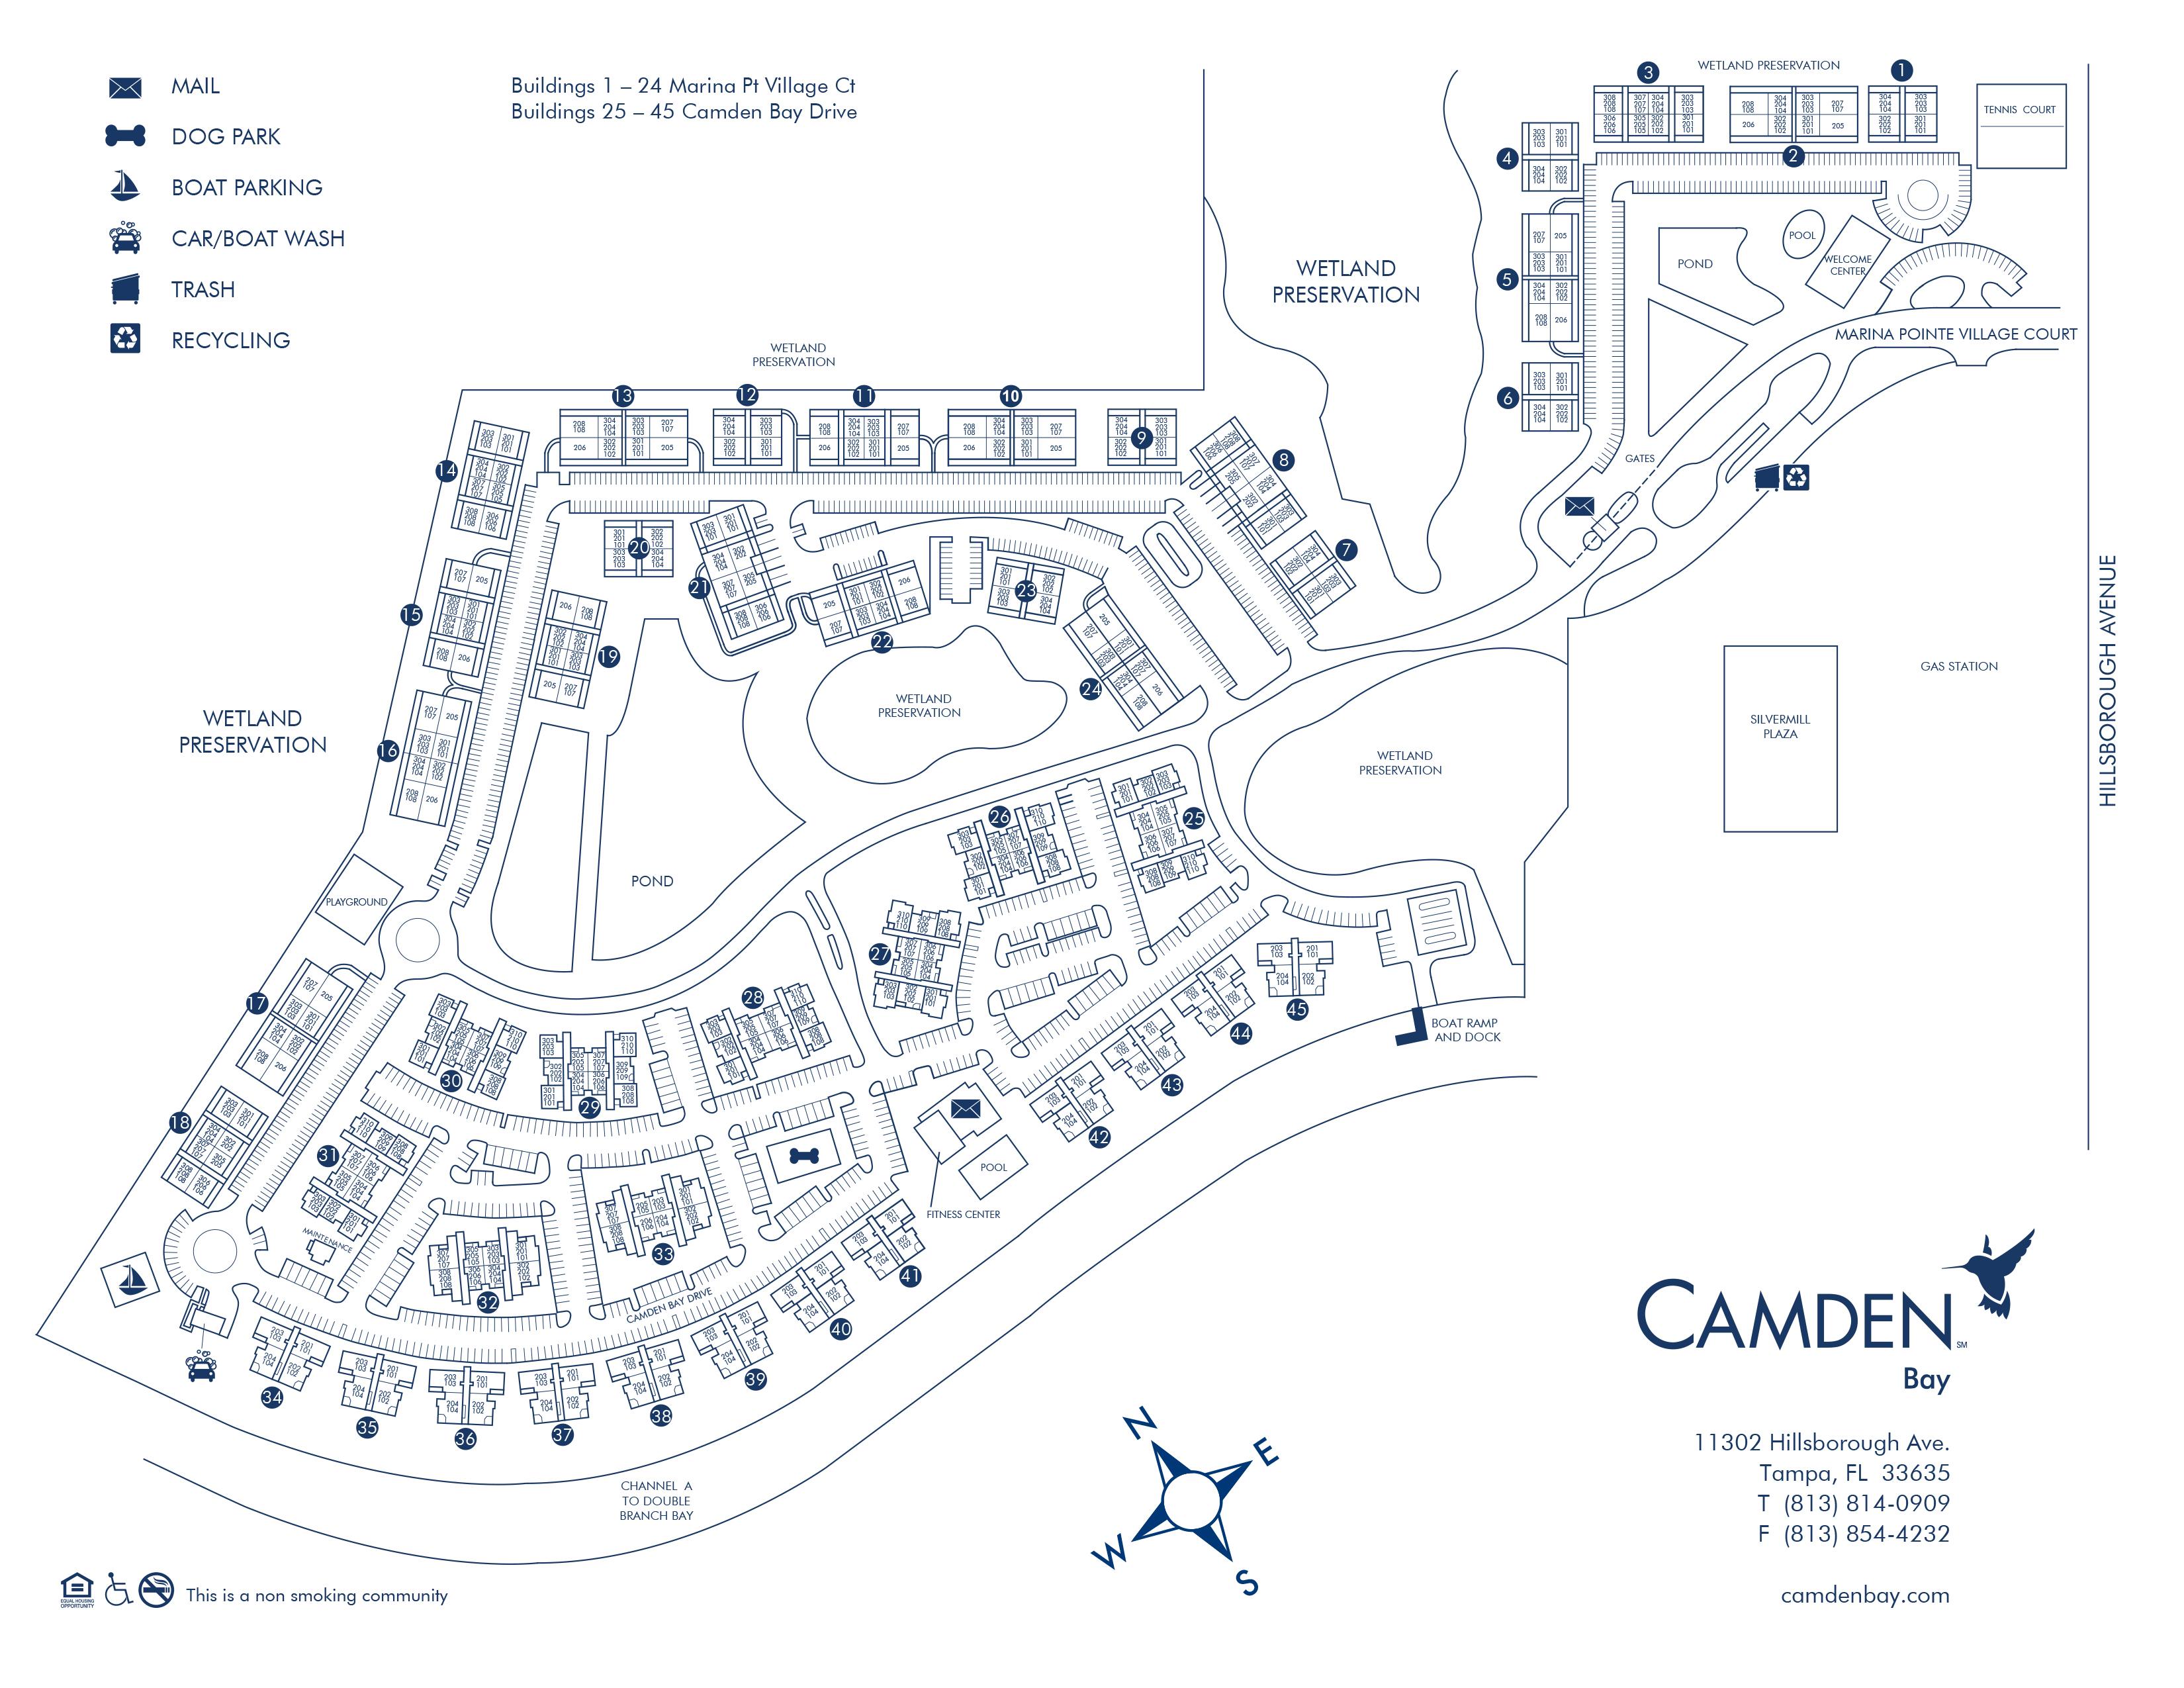 Camden Bay on westfield brandon map, westfield citrus mall map, westfield garden state plaza map, westfield countryside mall map, westfield utc map, orange park mall map, westfield mission valley map, franklin park mall map, westfield valley fair map,